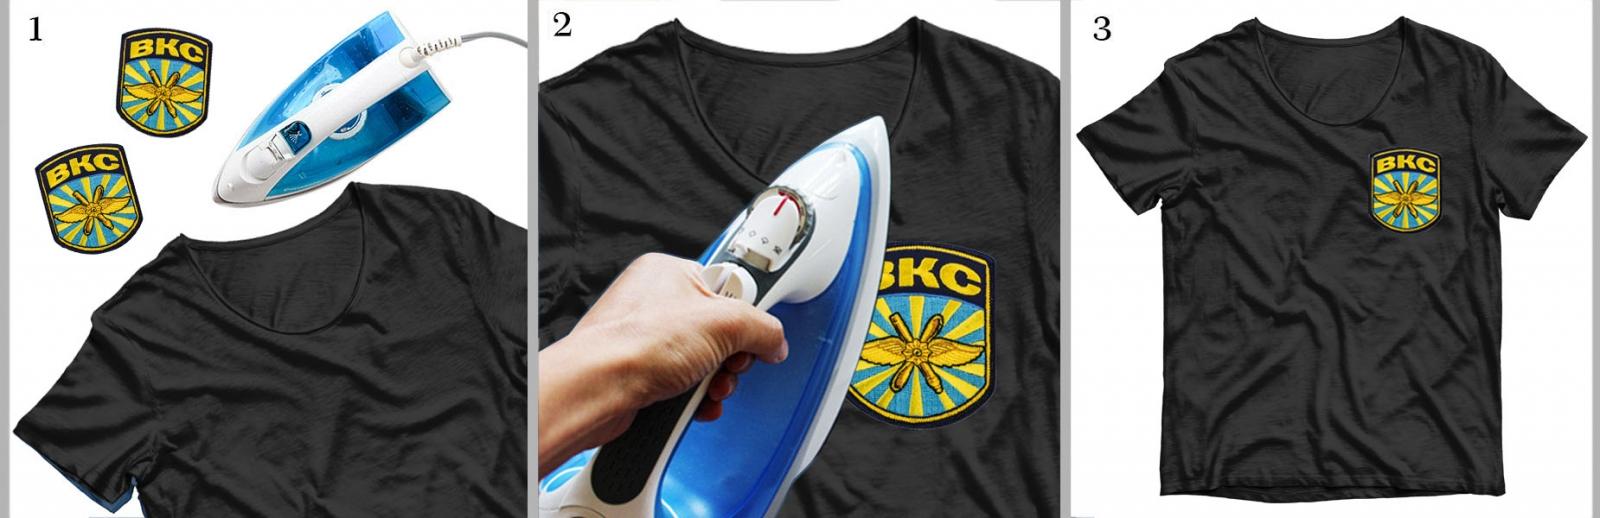 Шеврон ВКС на футболке